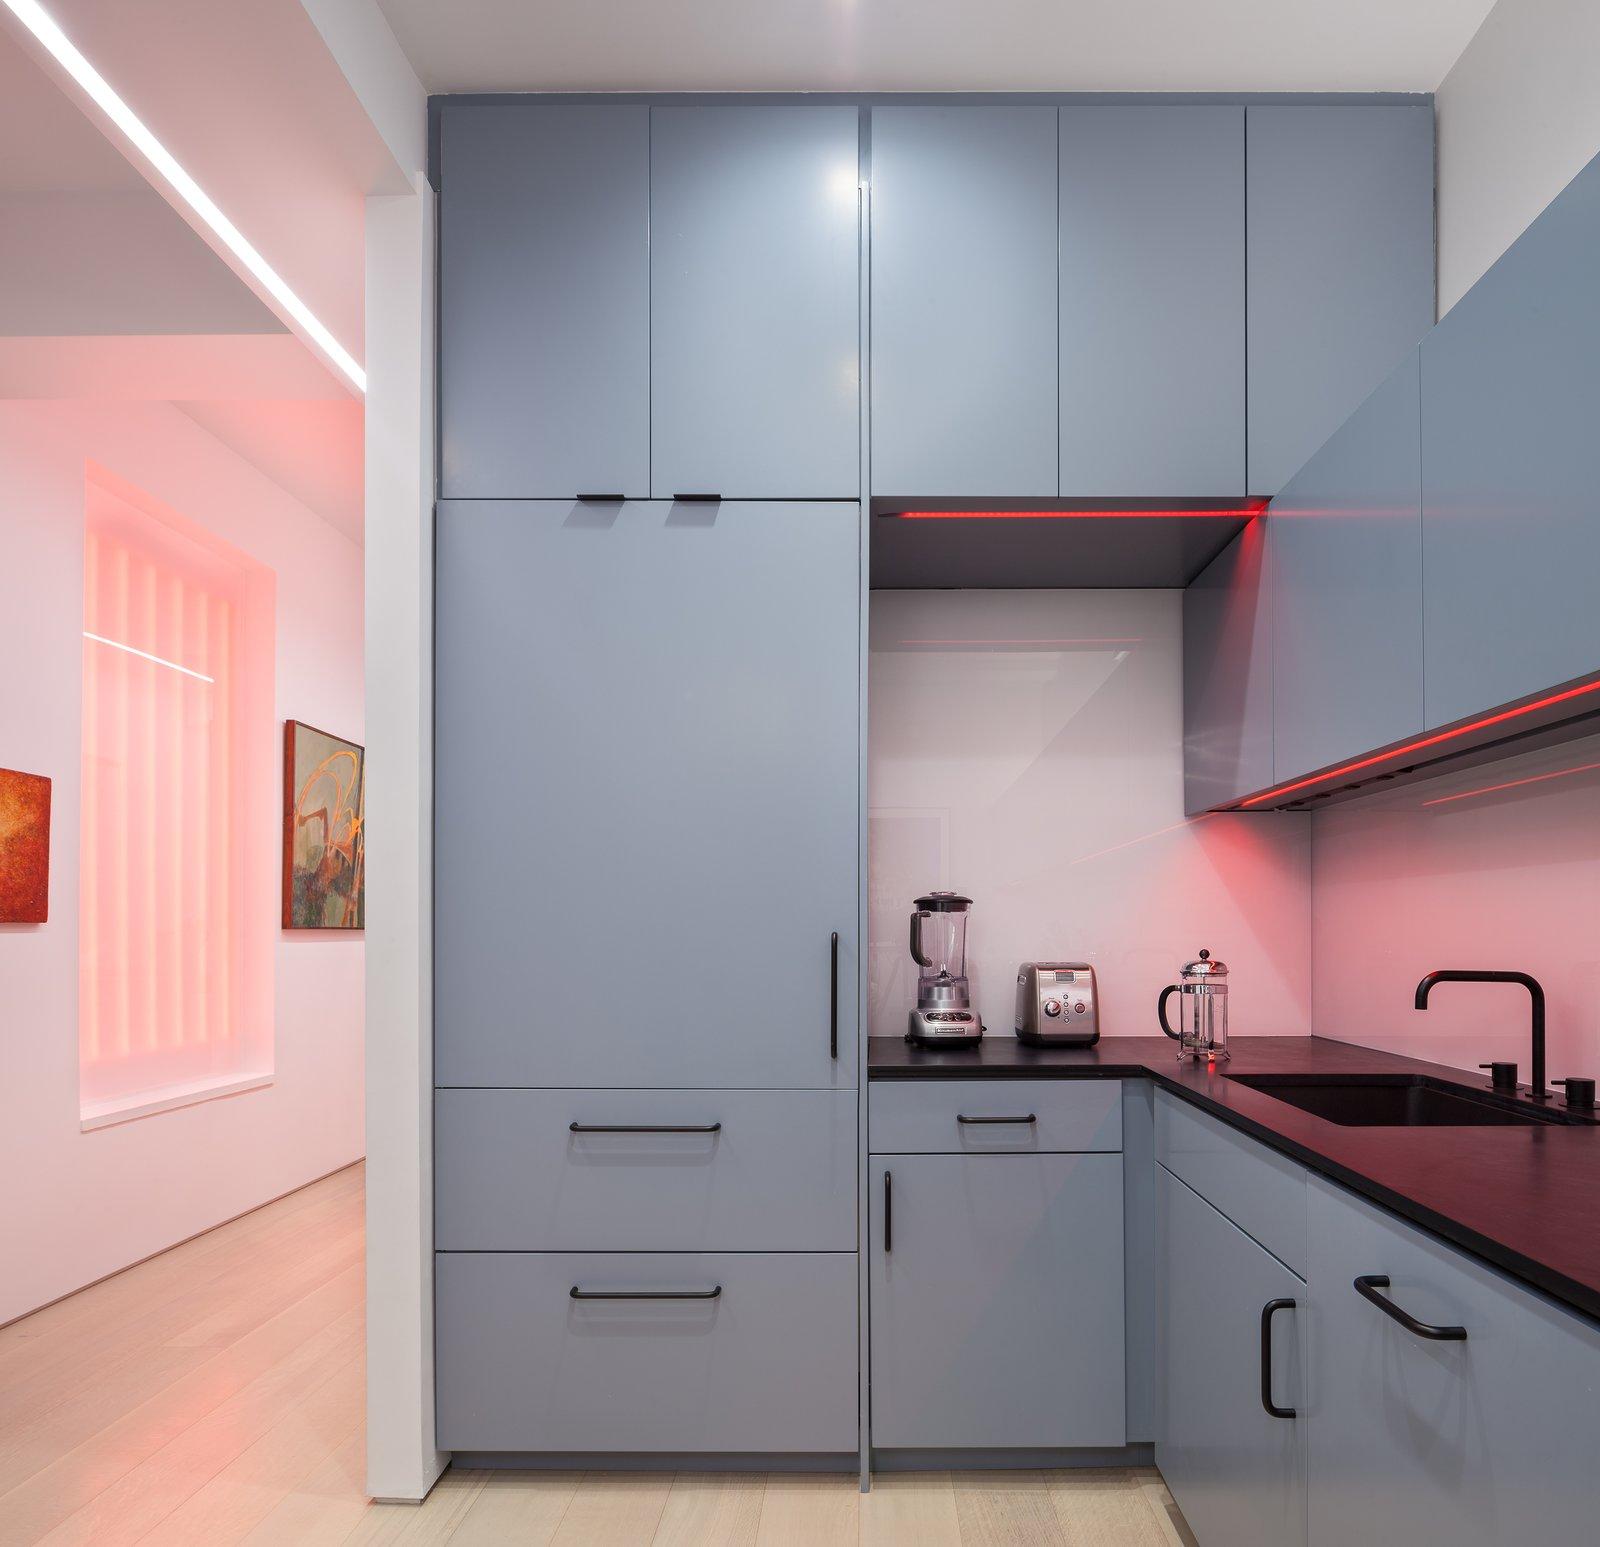 Kitchen, Colorful Cabinet, Ceiling Lighting, Light Hardwood Floor, Recessed Lighting, Accent Lighting, Refrigerator, Dishwasher, and Undermount Sink  Best Photos